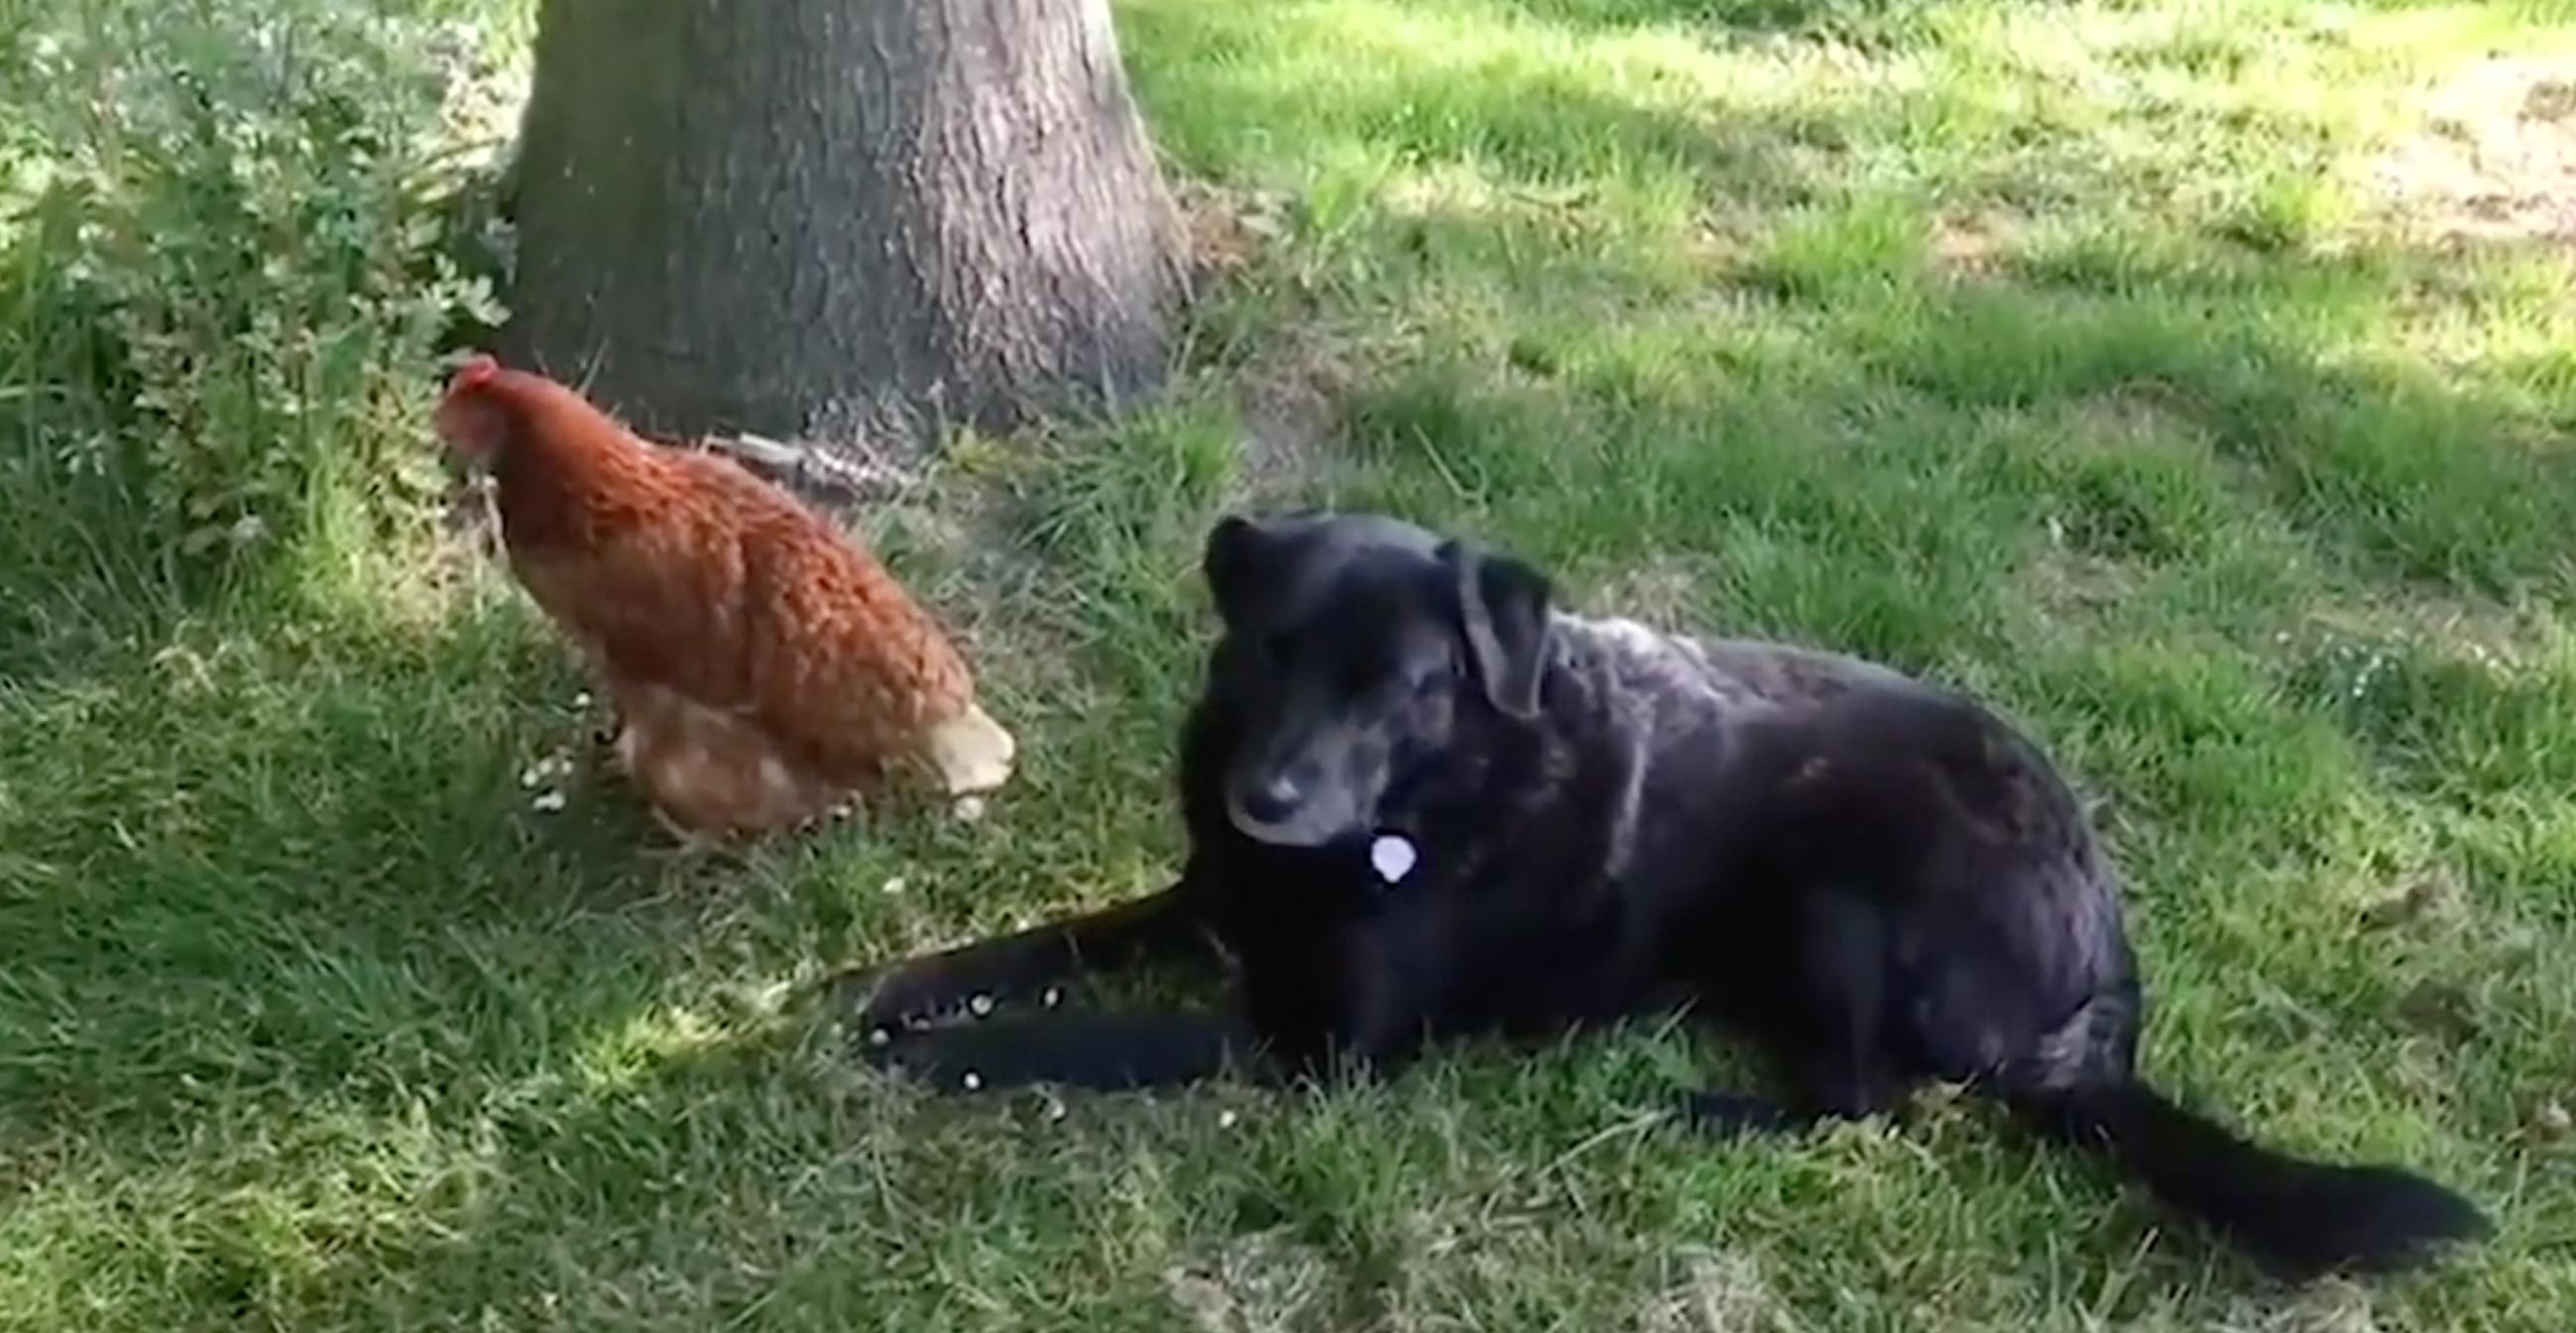 dog and hen best friends